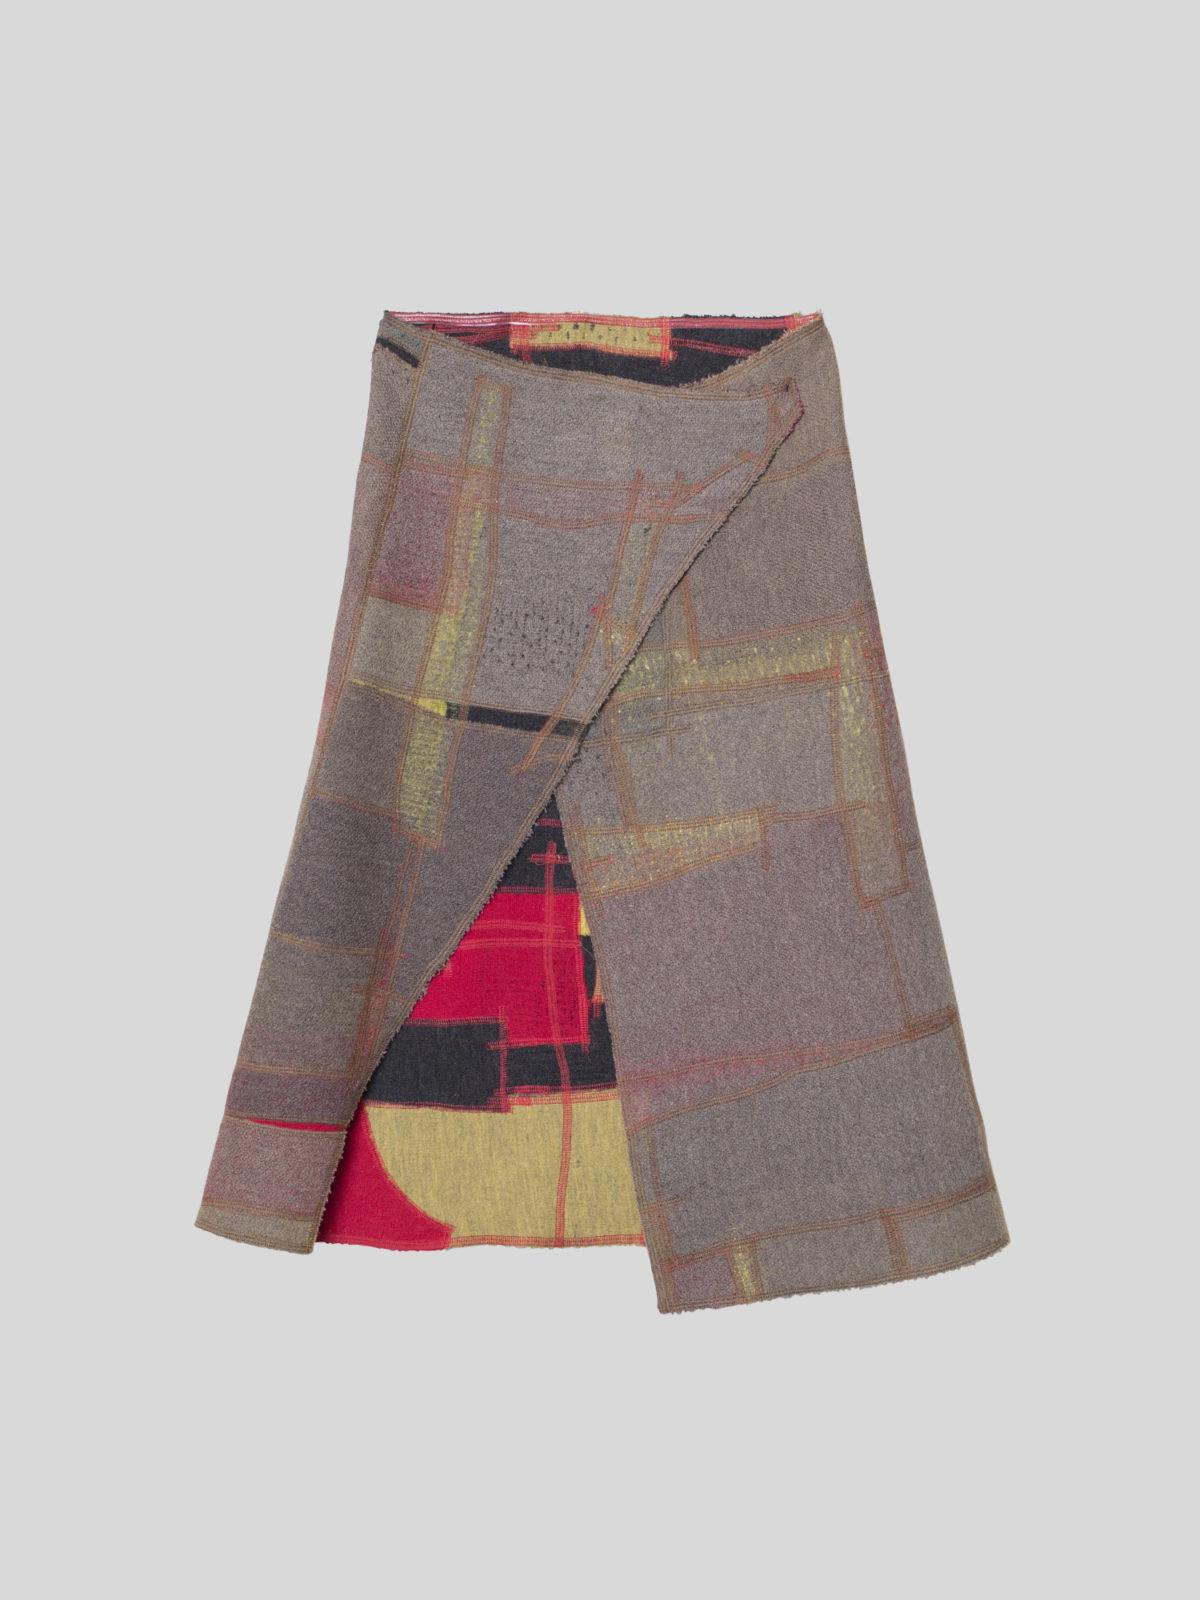 reversible-skirt-by-sigi-ahl-eileenfisherdesignwork-1200x1600